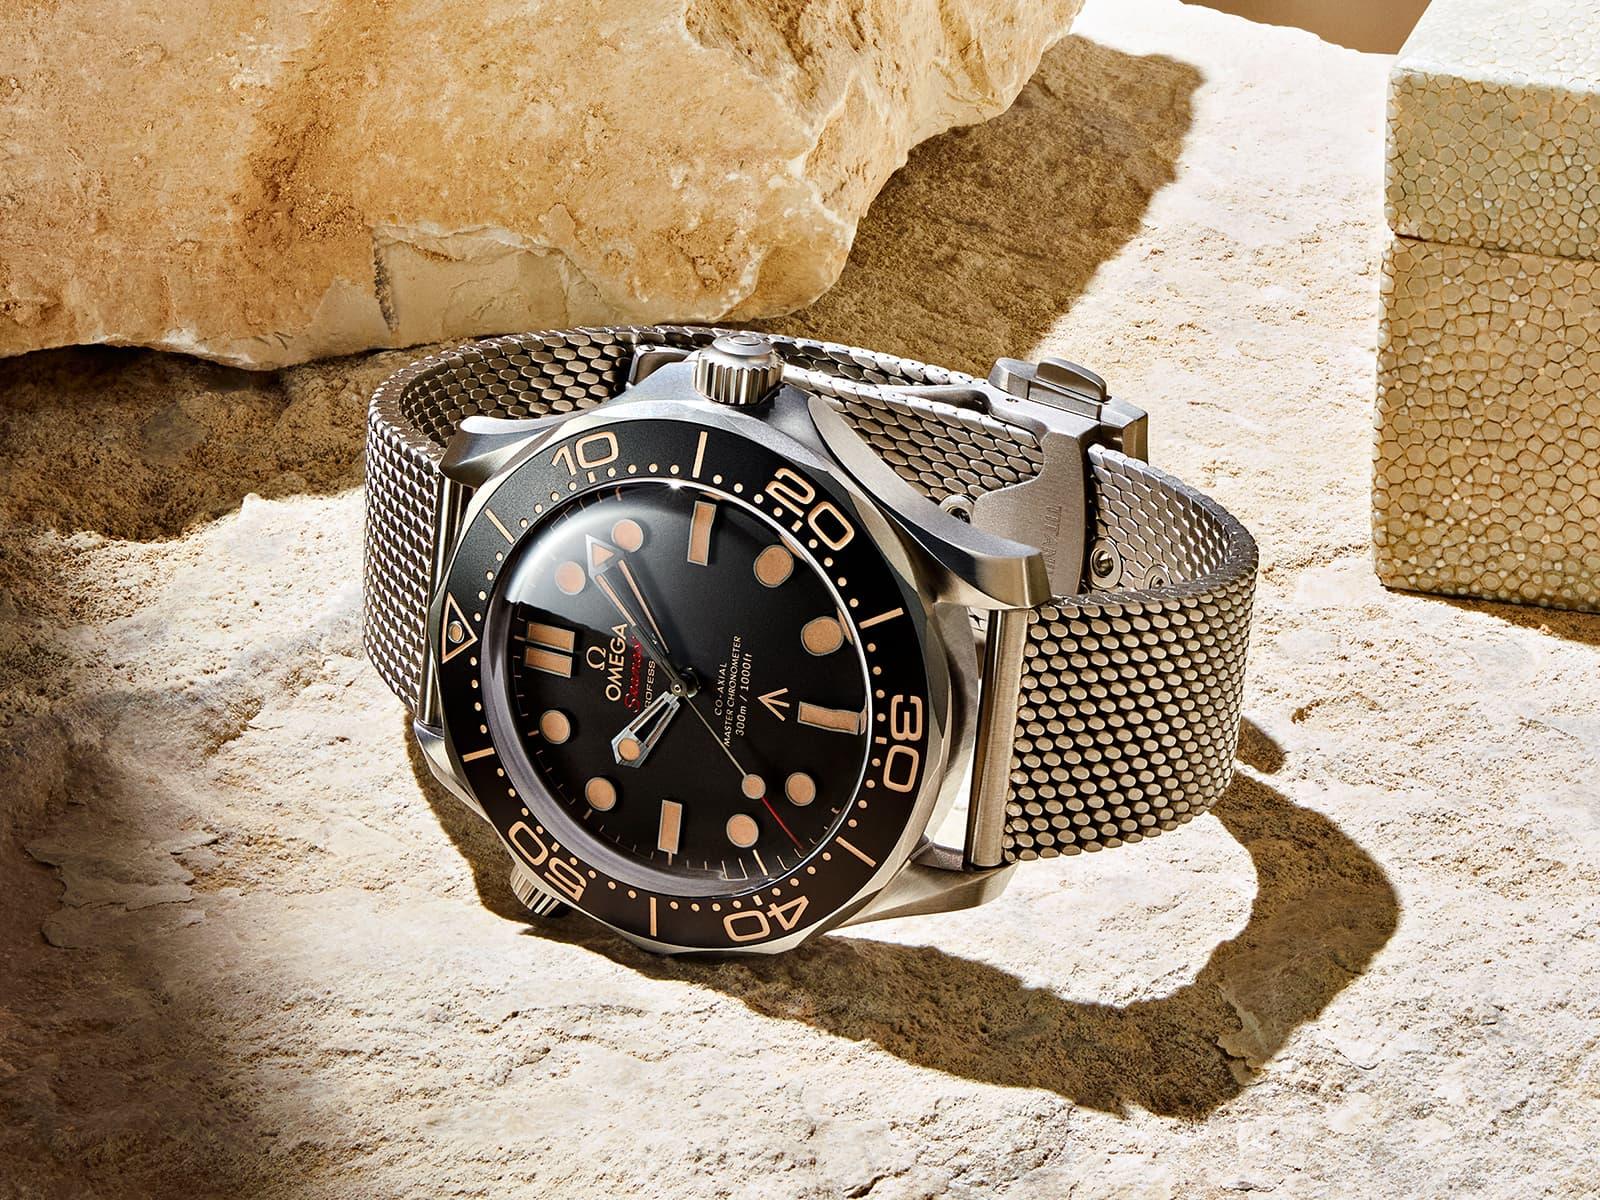 210-90-42-20-01-001-omega-seamaster-diver-300m-007-edition-1.jpg